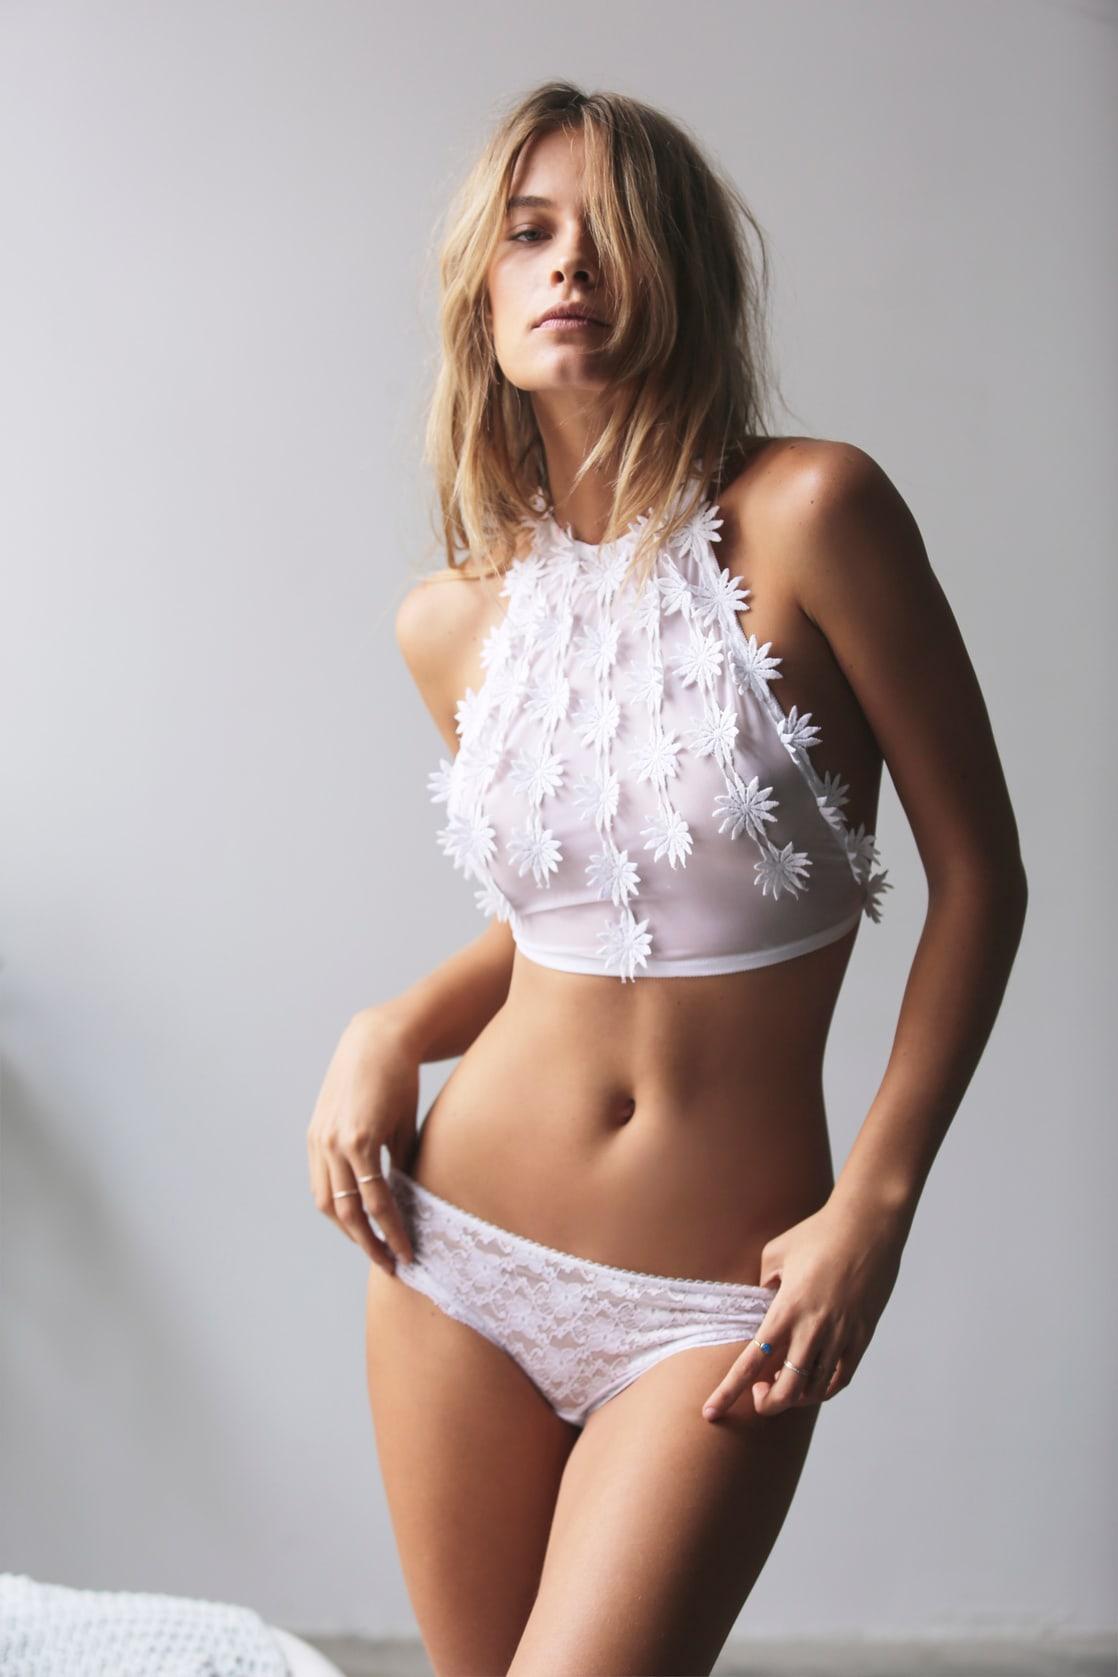 Hot Barbara Di Creddo nude (67 photo), Pussy, Sideboobs, Feet, butt 2015